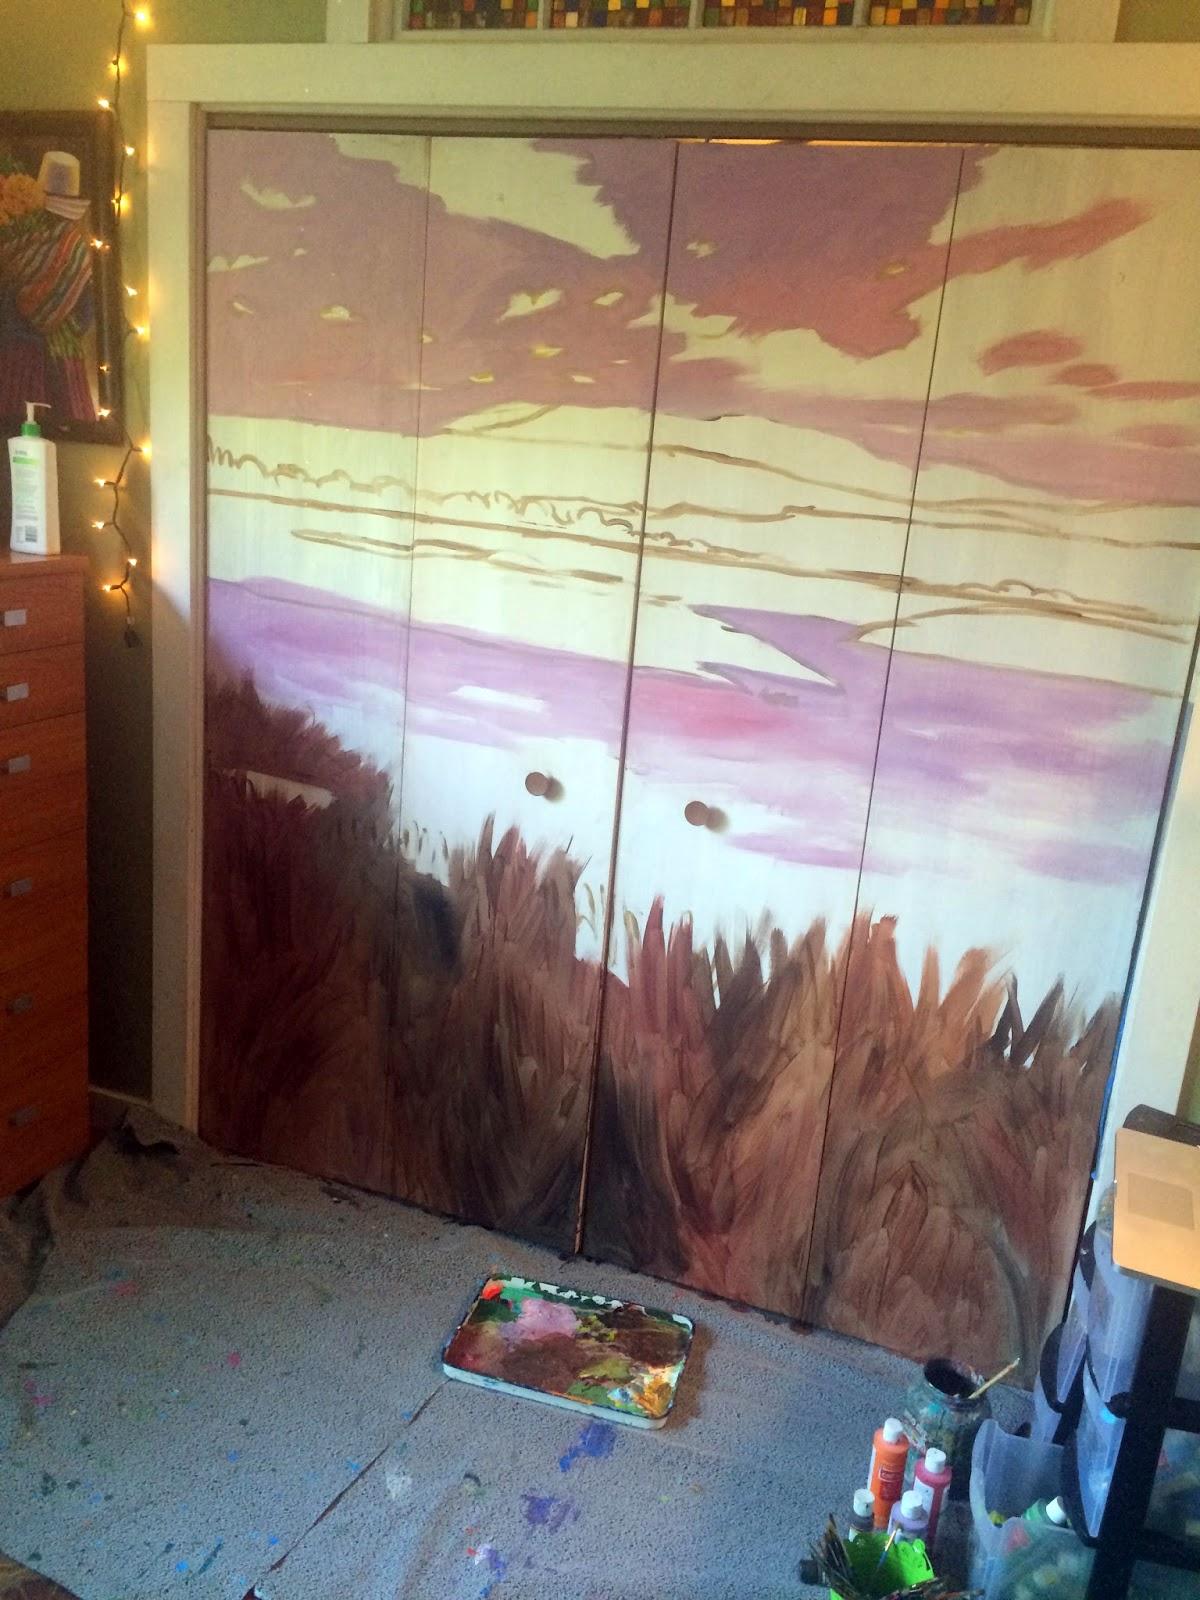 central oregon painting, malheur wilderness area, oregon bird painting, bird watching art, oregon muralist, portland muralist